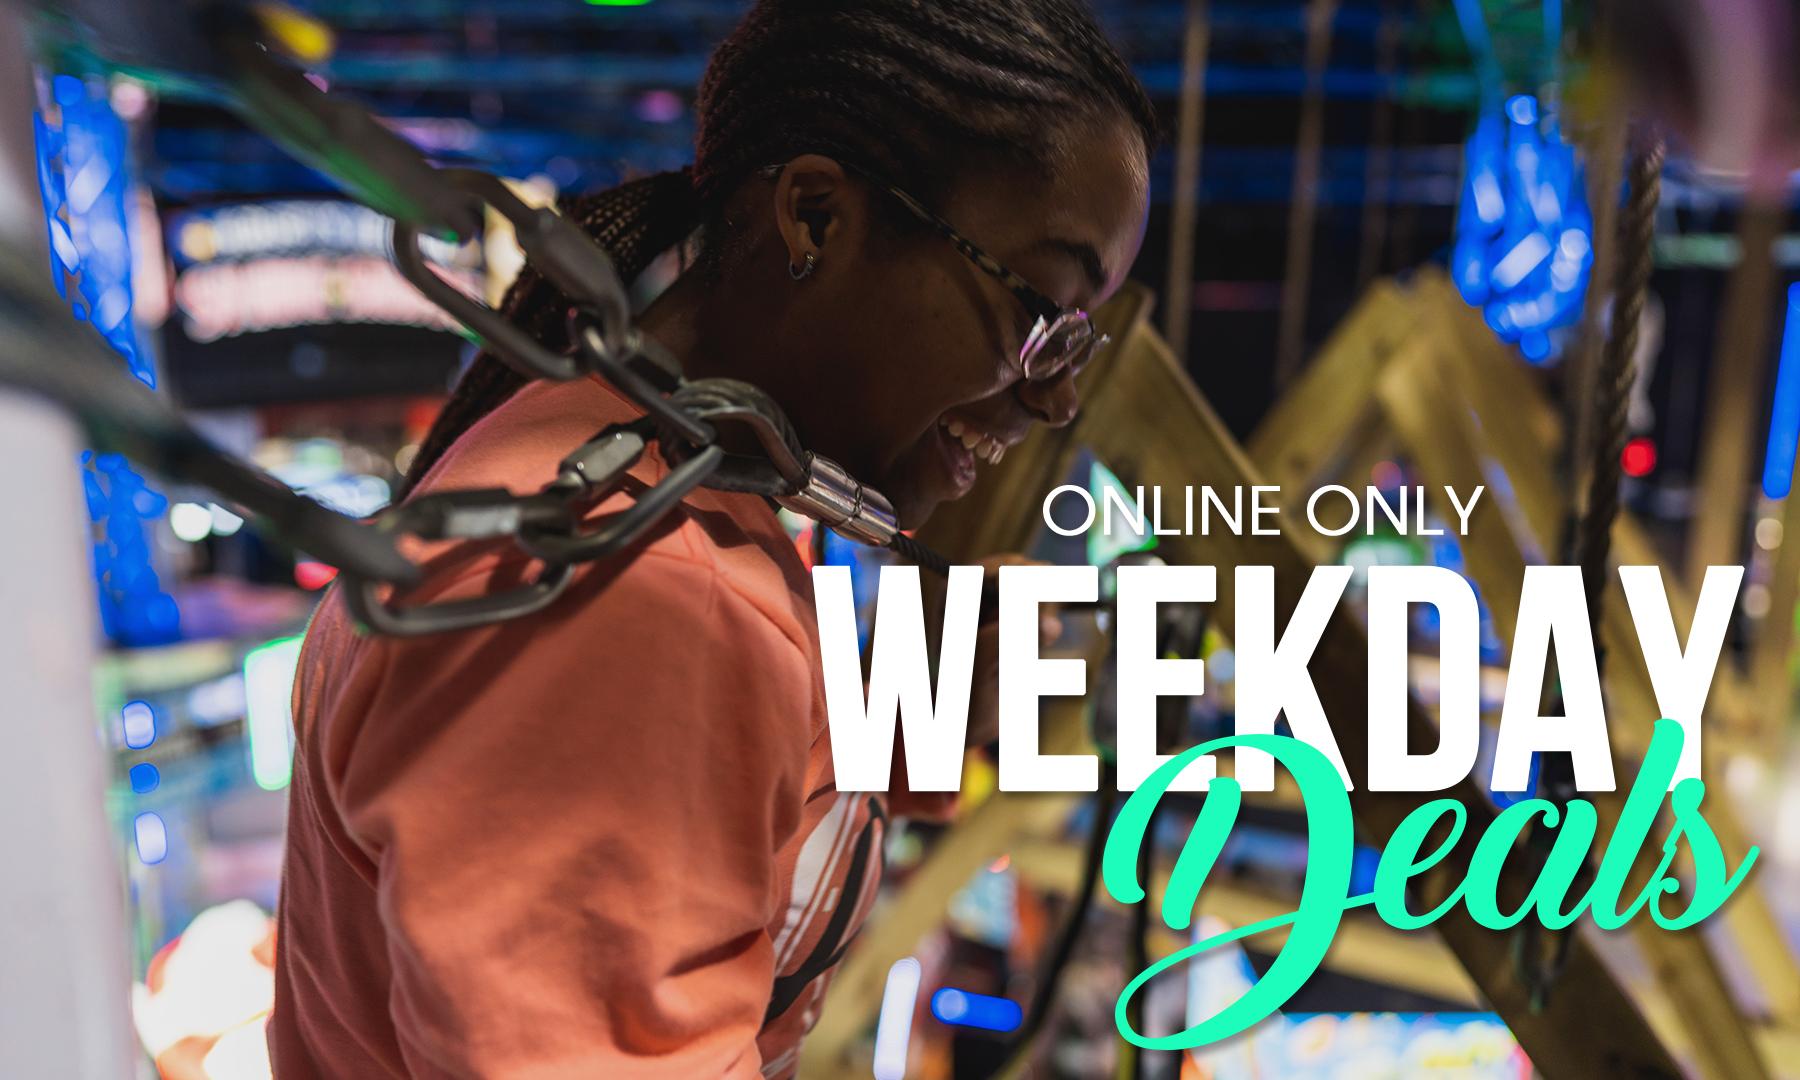 Online Only Weekday Specials